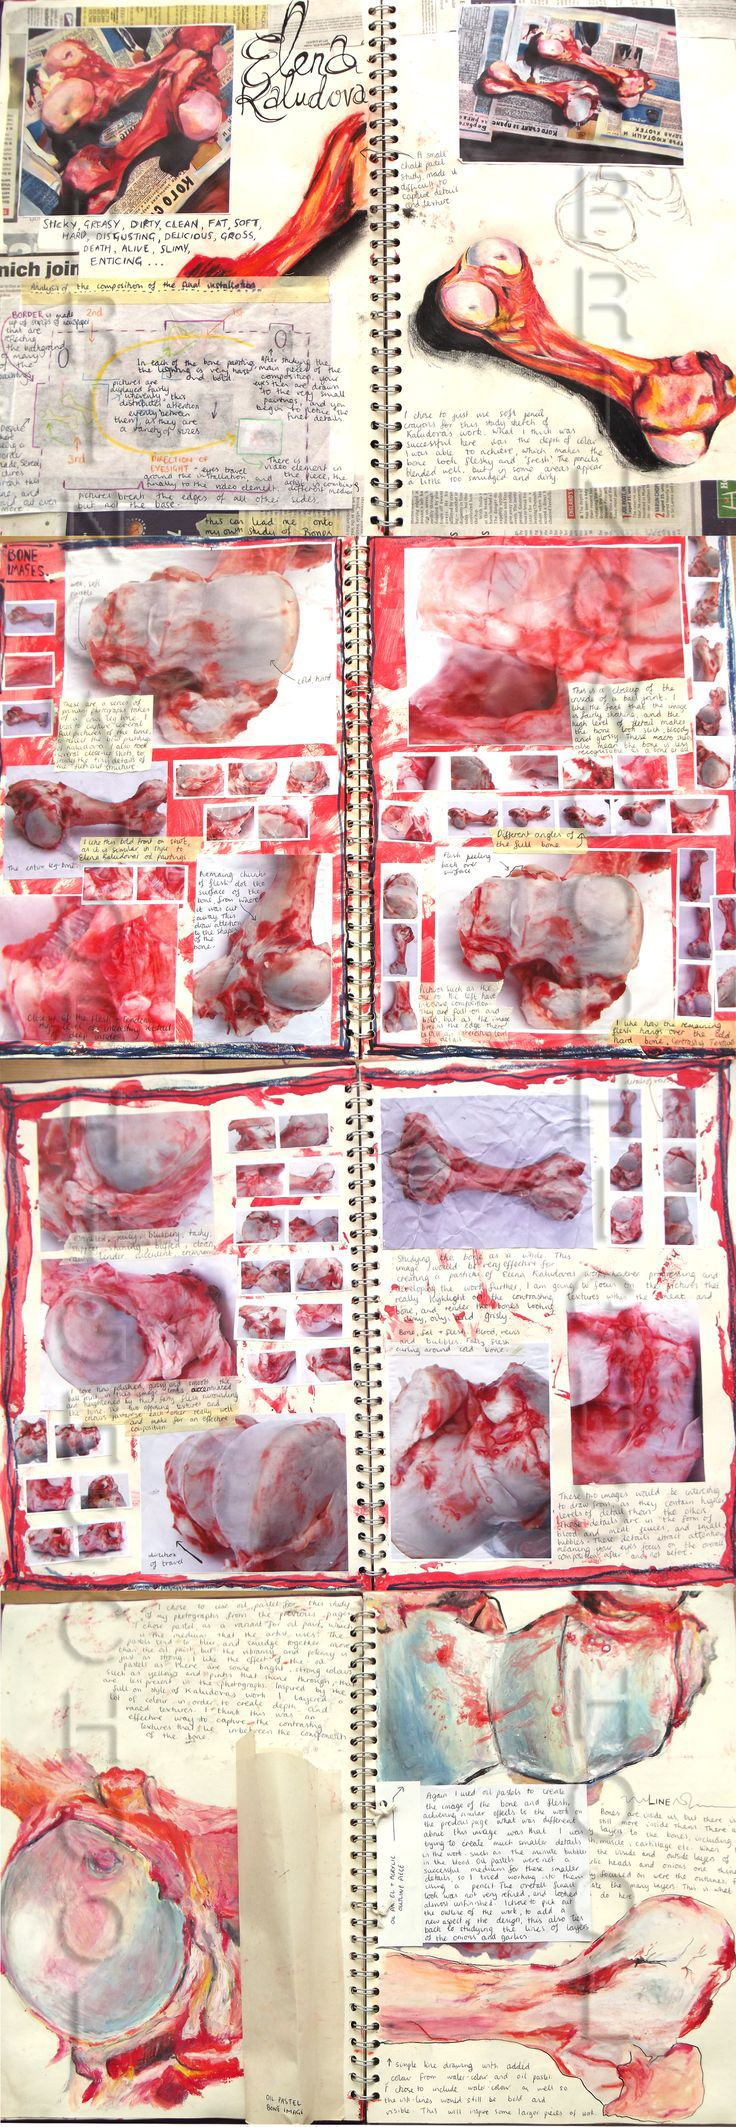 A2 ART - INSIDE,OUTSIDE,IN-BETWEEN Lauren NurseAO1,AO2,AO3,Development and sketchbook work- Bones- Springwood Highschool